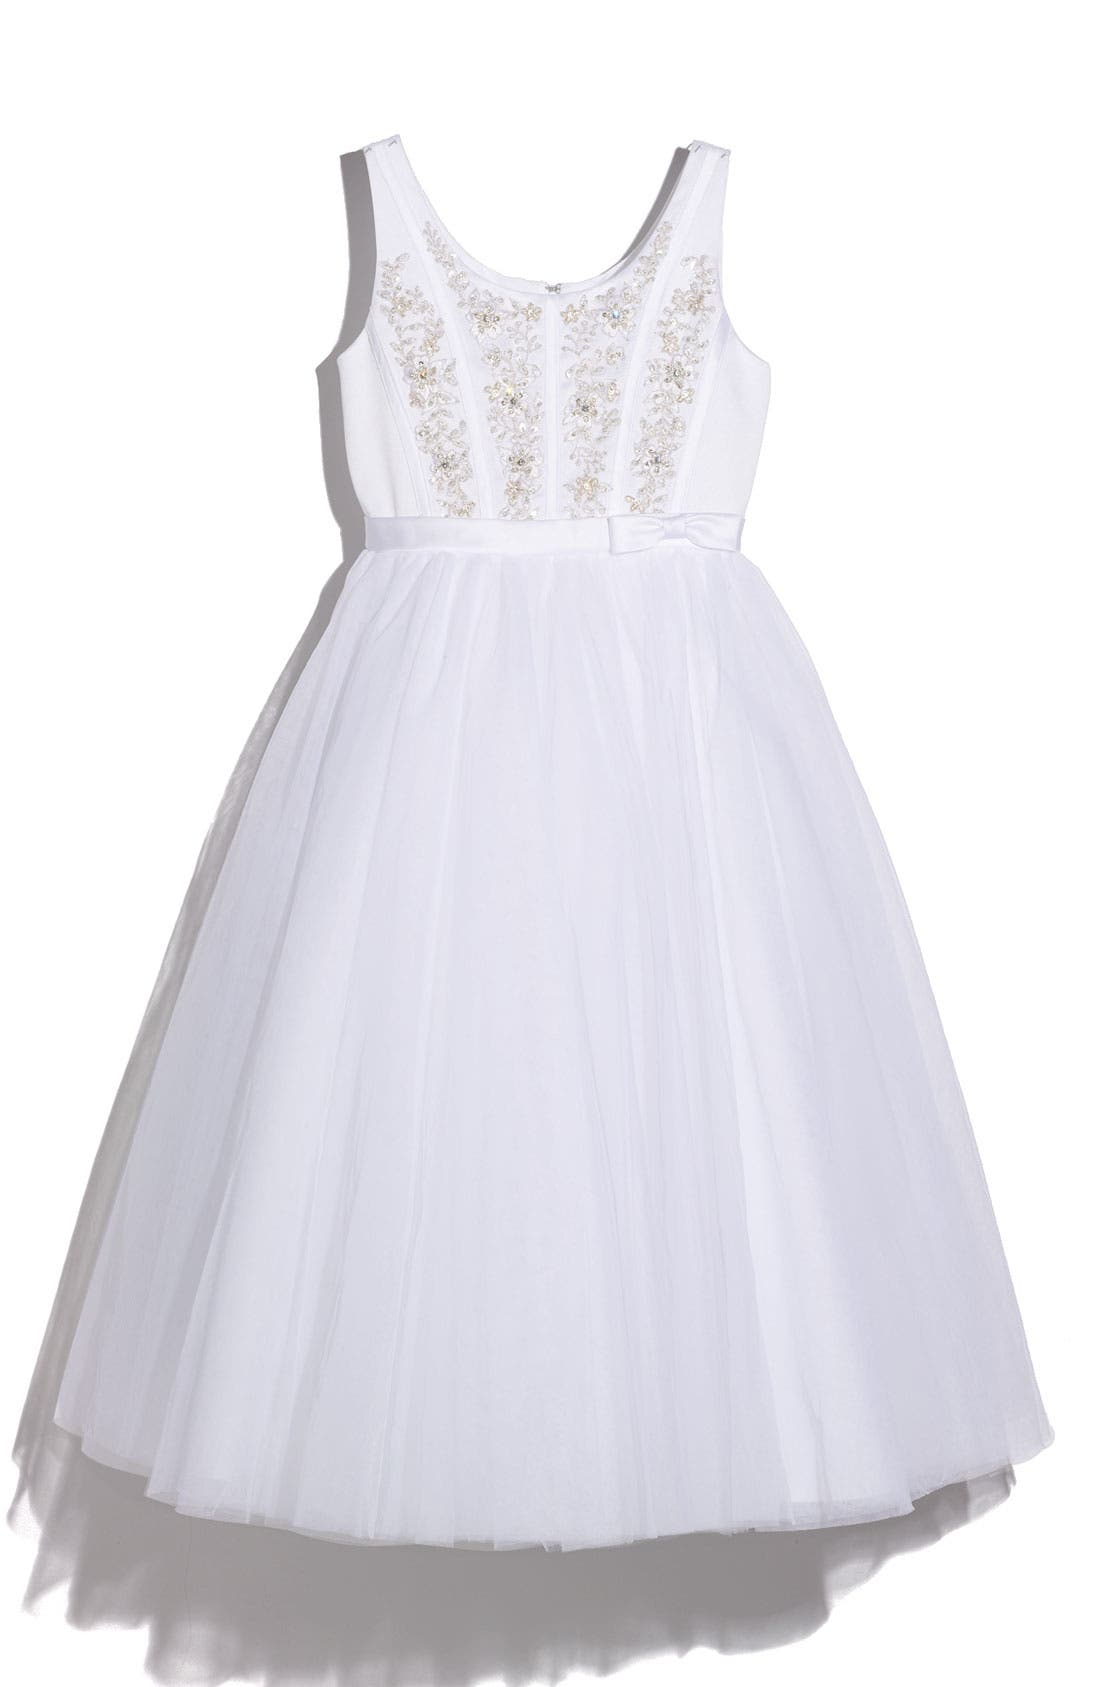 Alternate Image 1 Selected - Joan Calabrese for Mon Cheri Satin Sequin Dress (Big Girls)